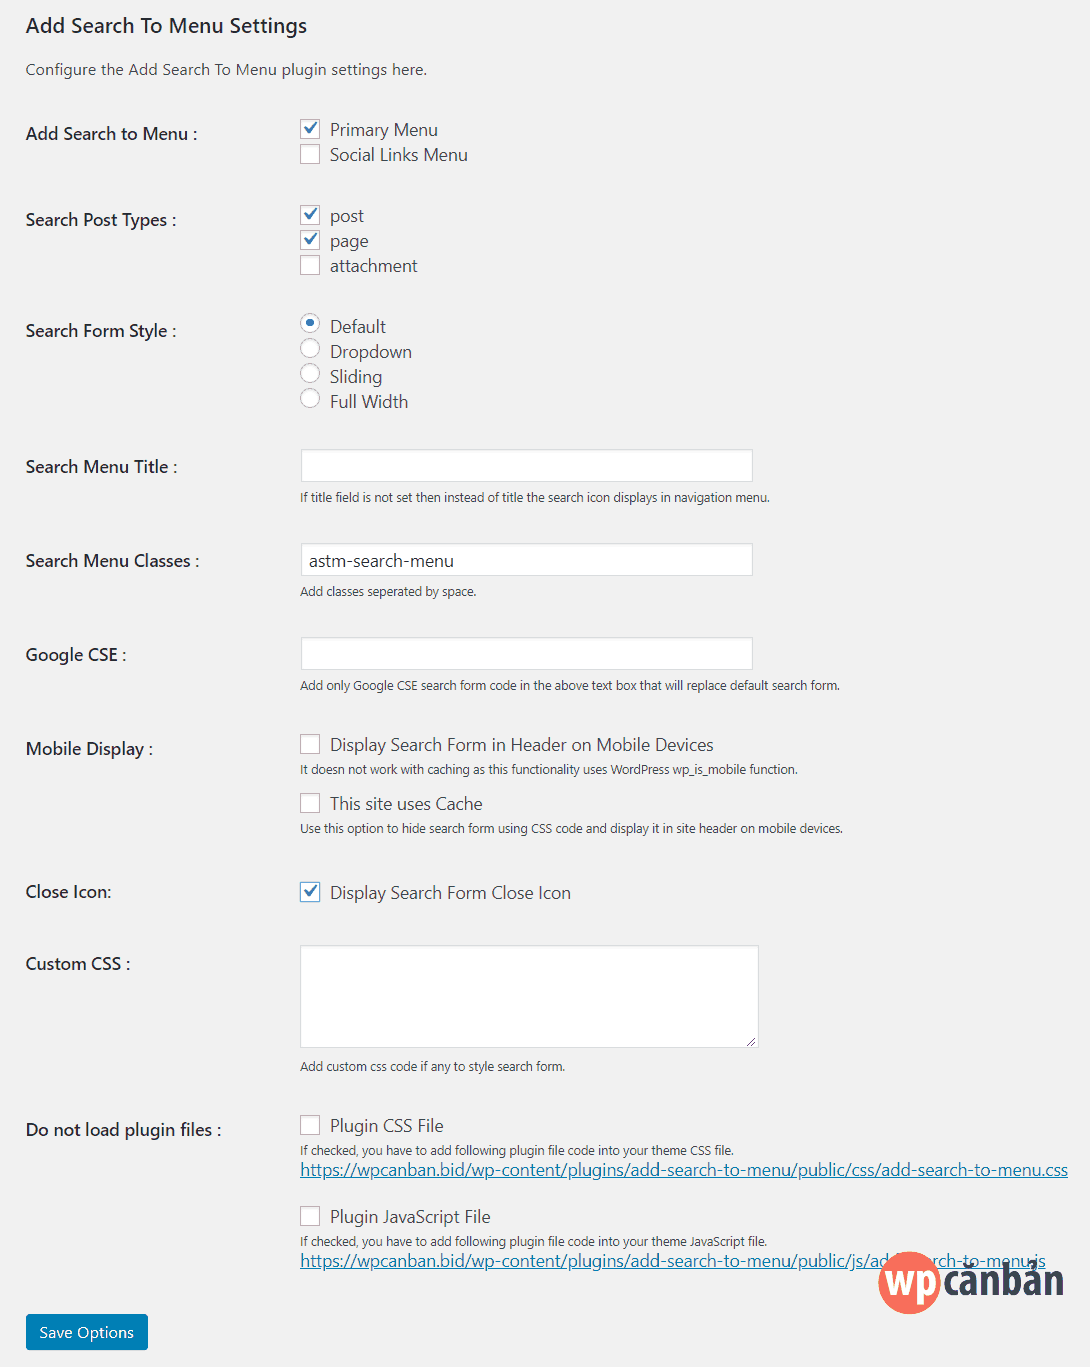 thiet-lap-plugin-add-search-to-menu